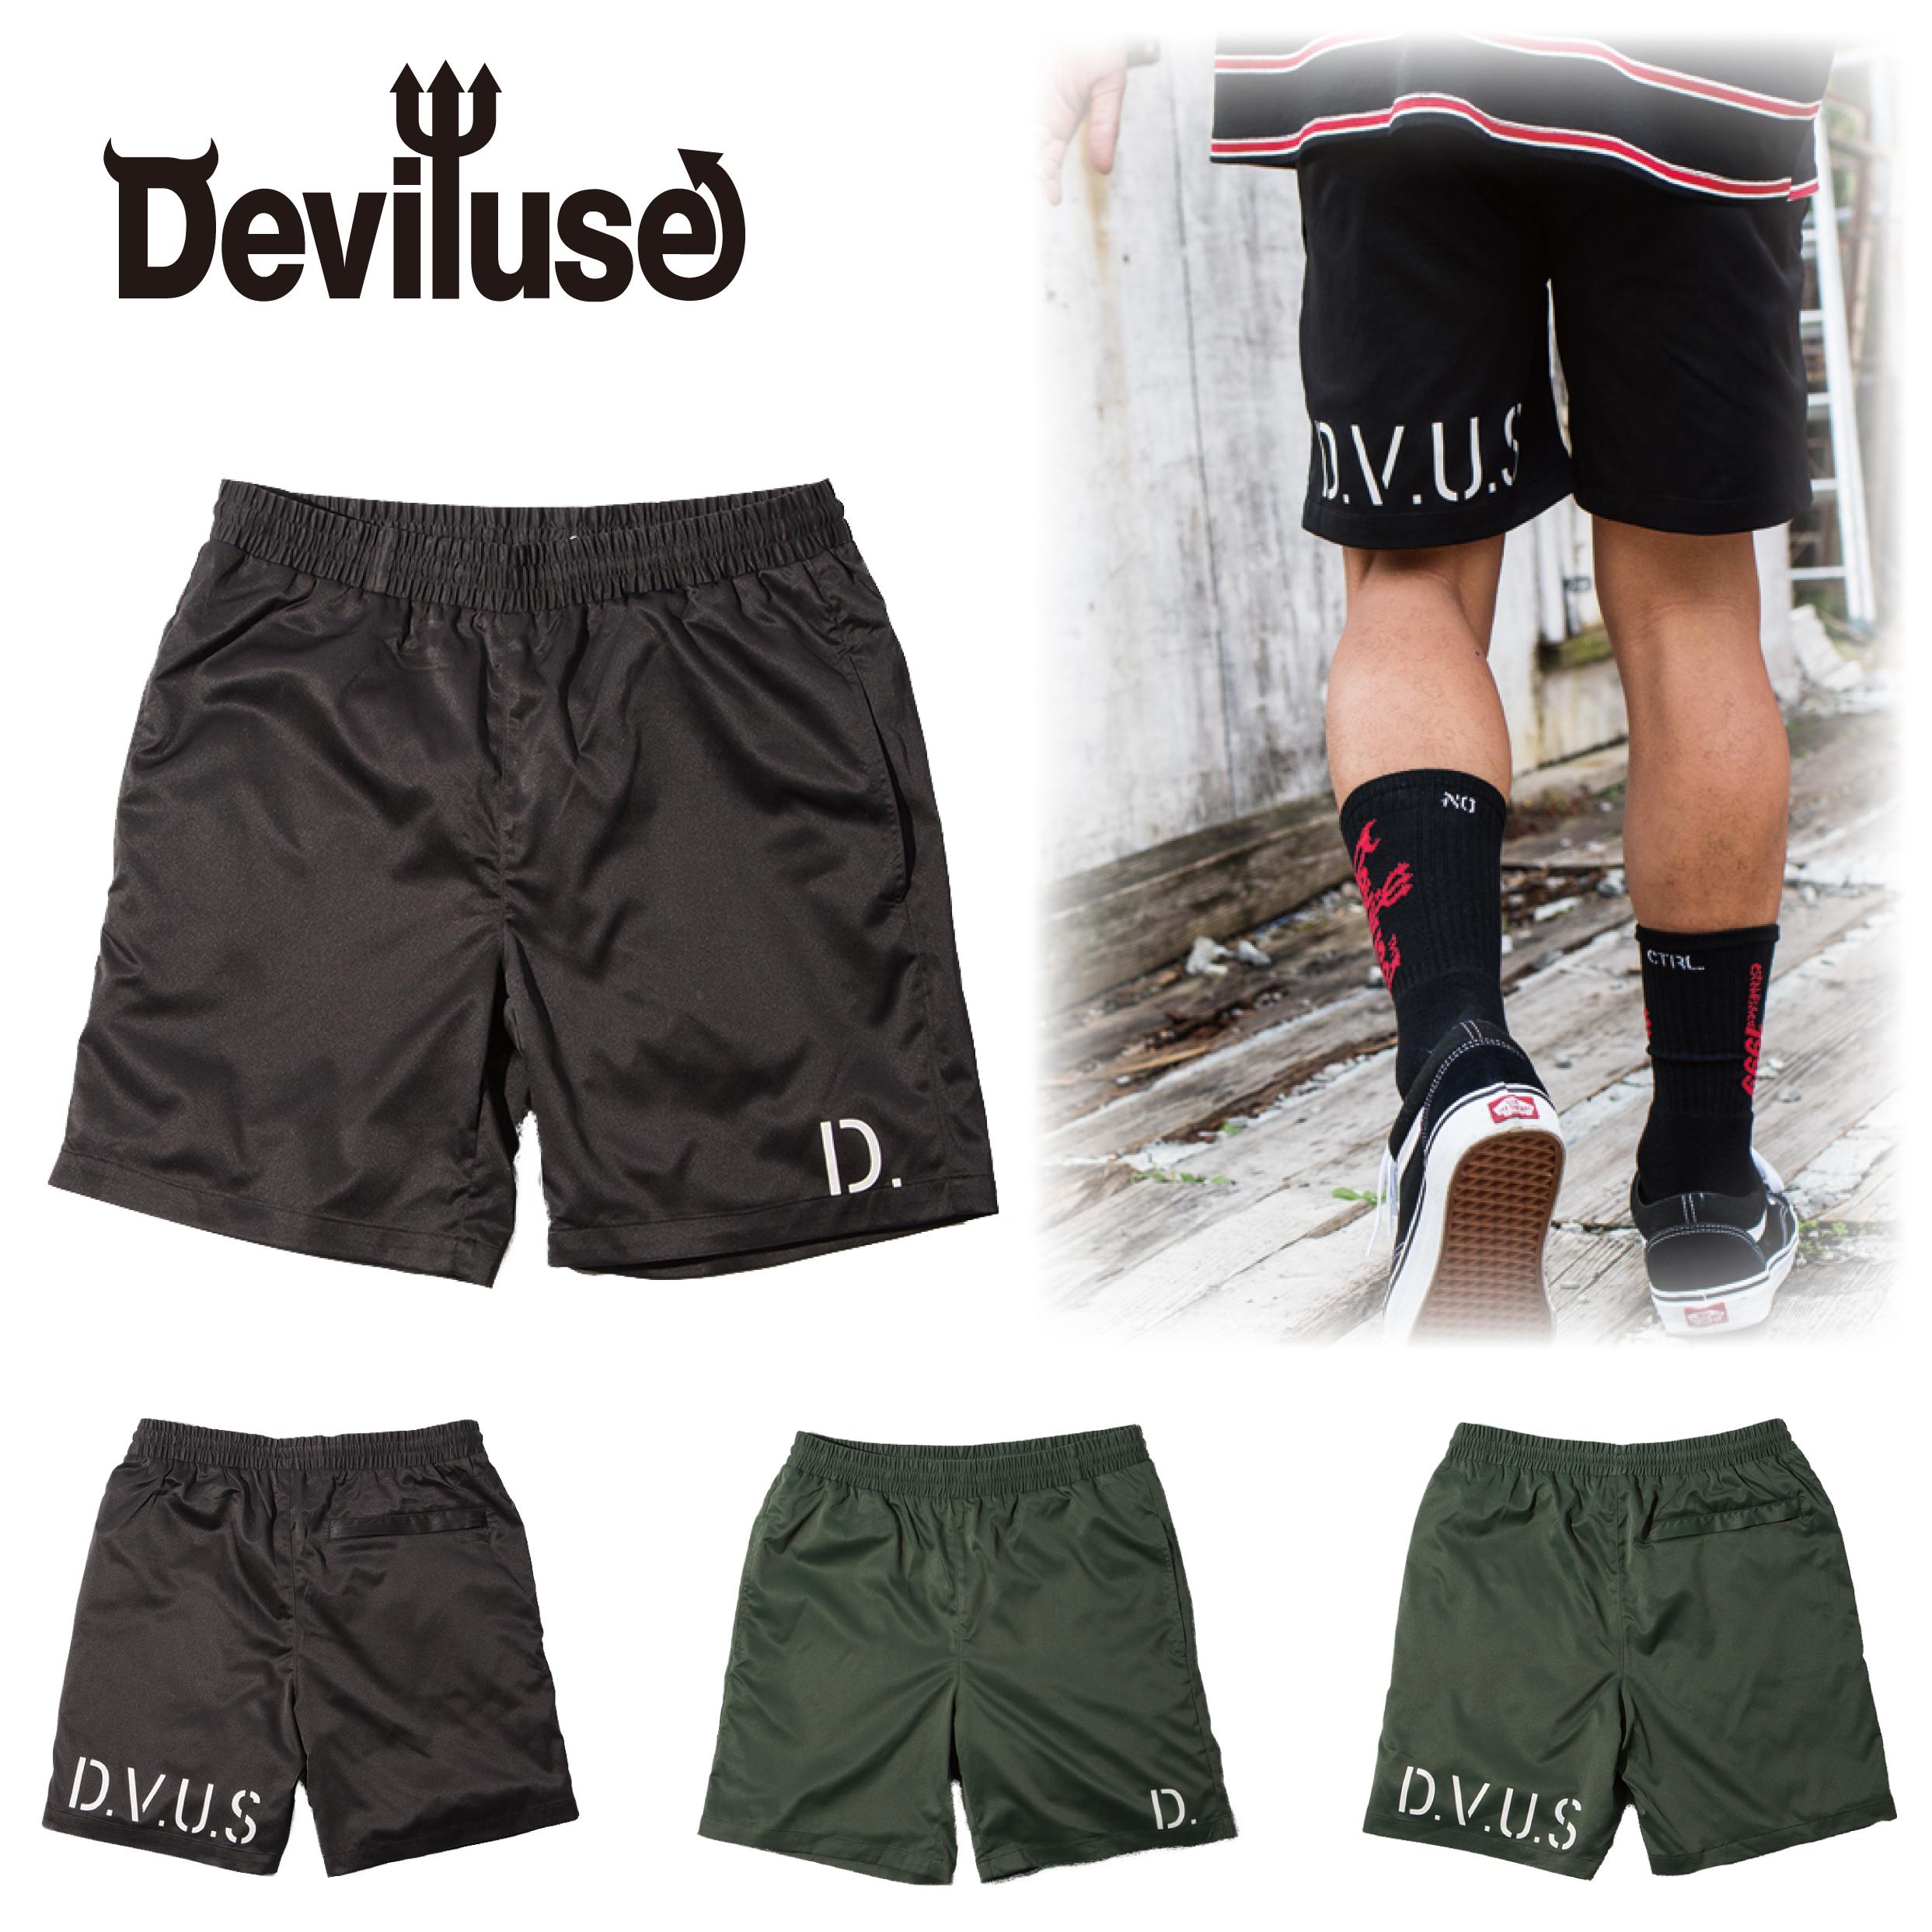 Deviluse(デビルユース) | D. Hybrid Shorts